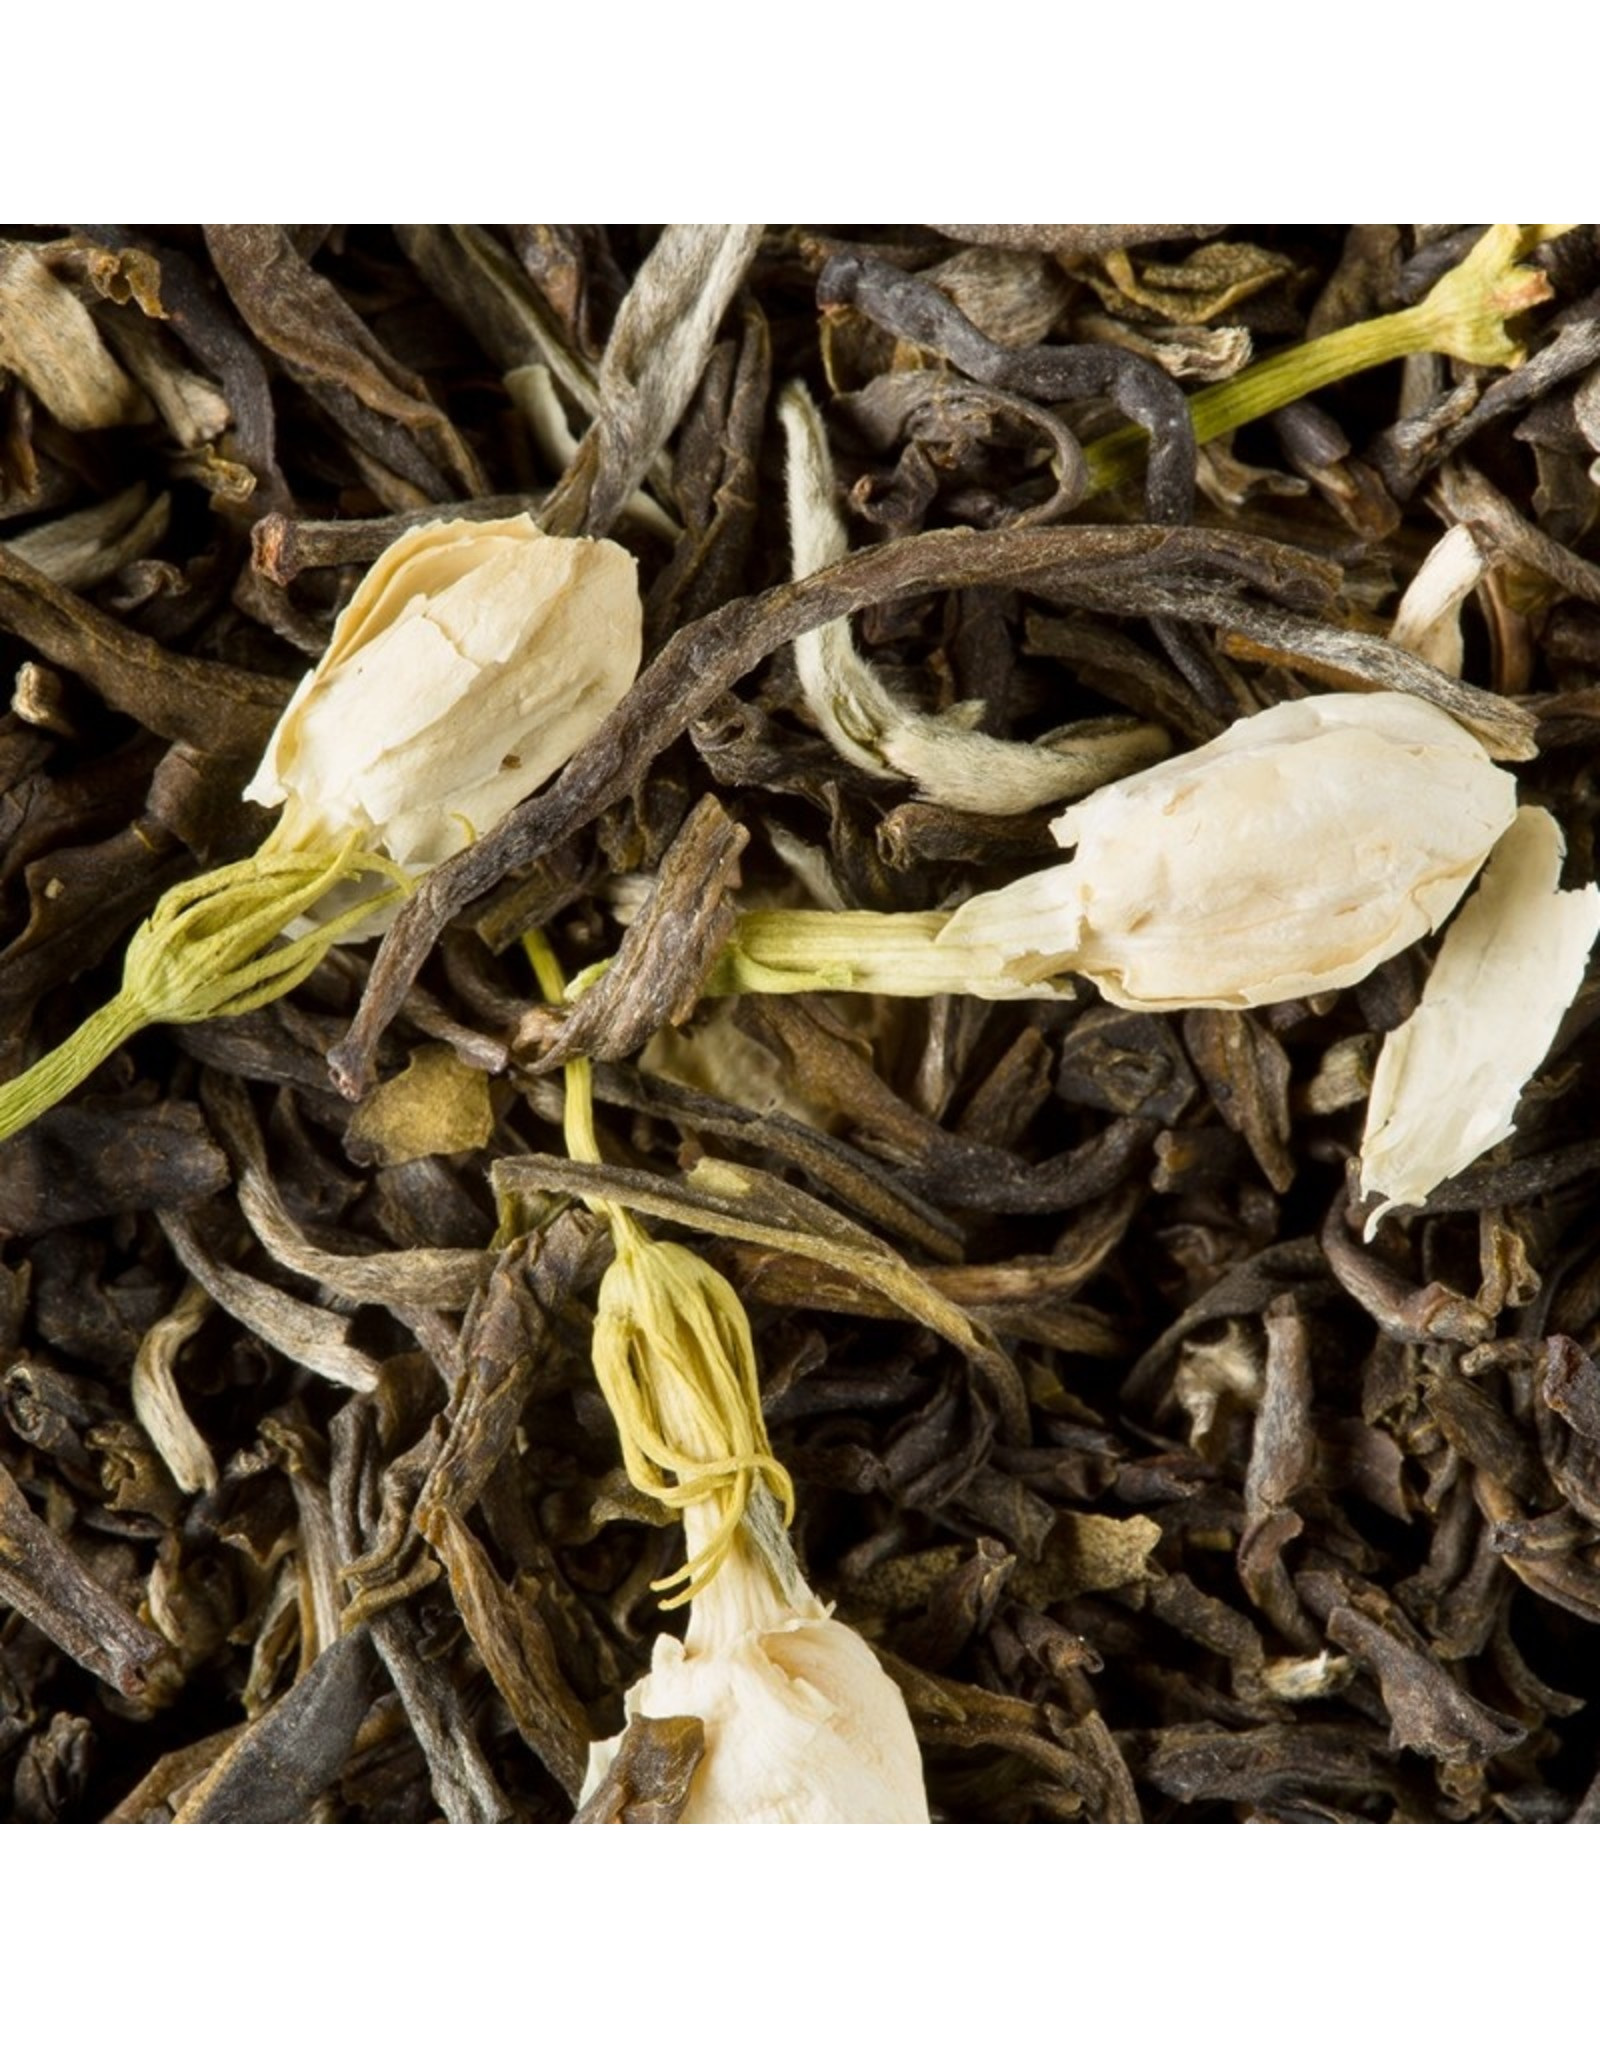 Dammann 'Jasmin' Green tea